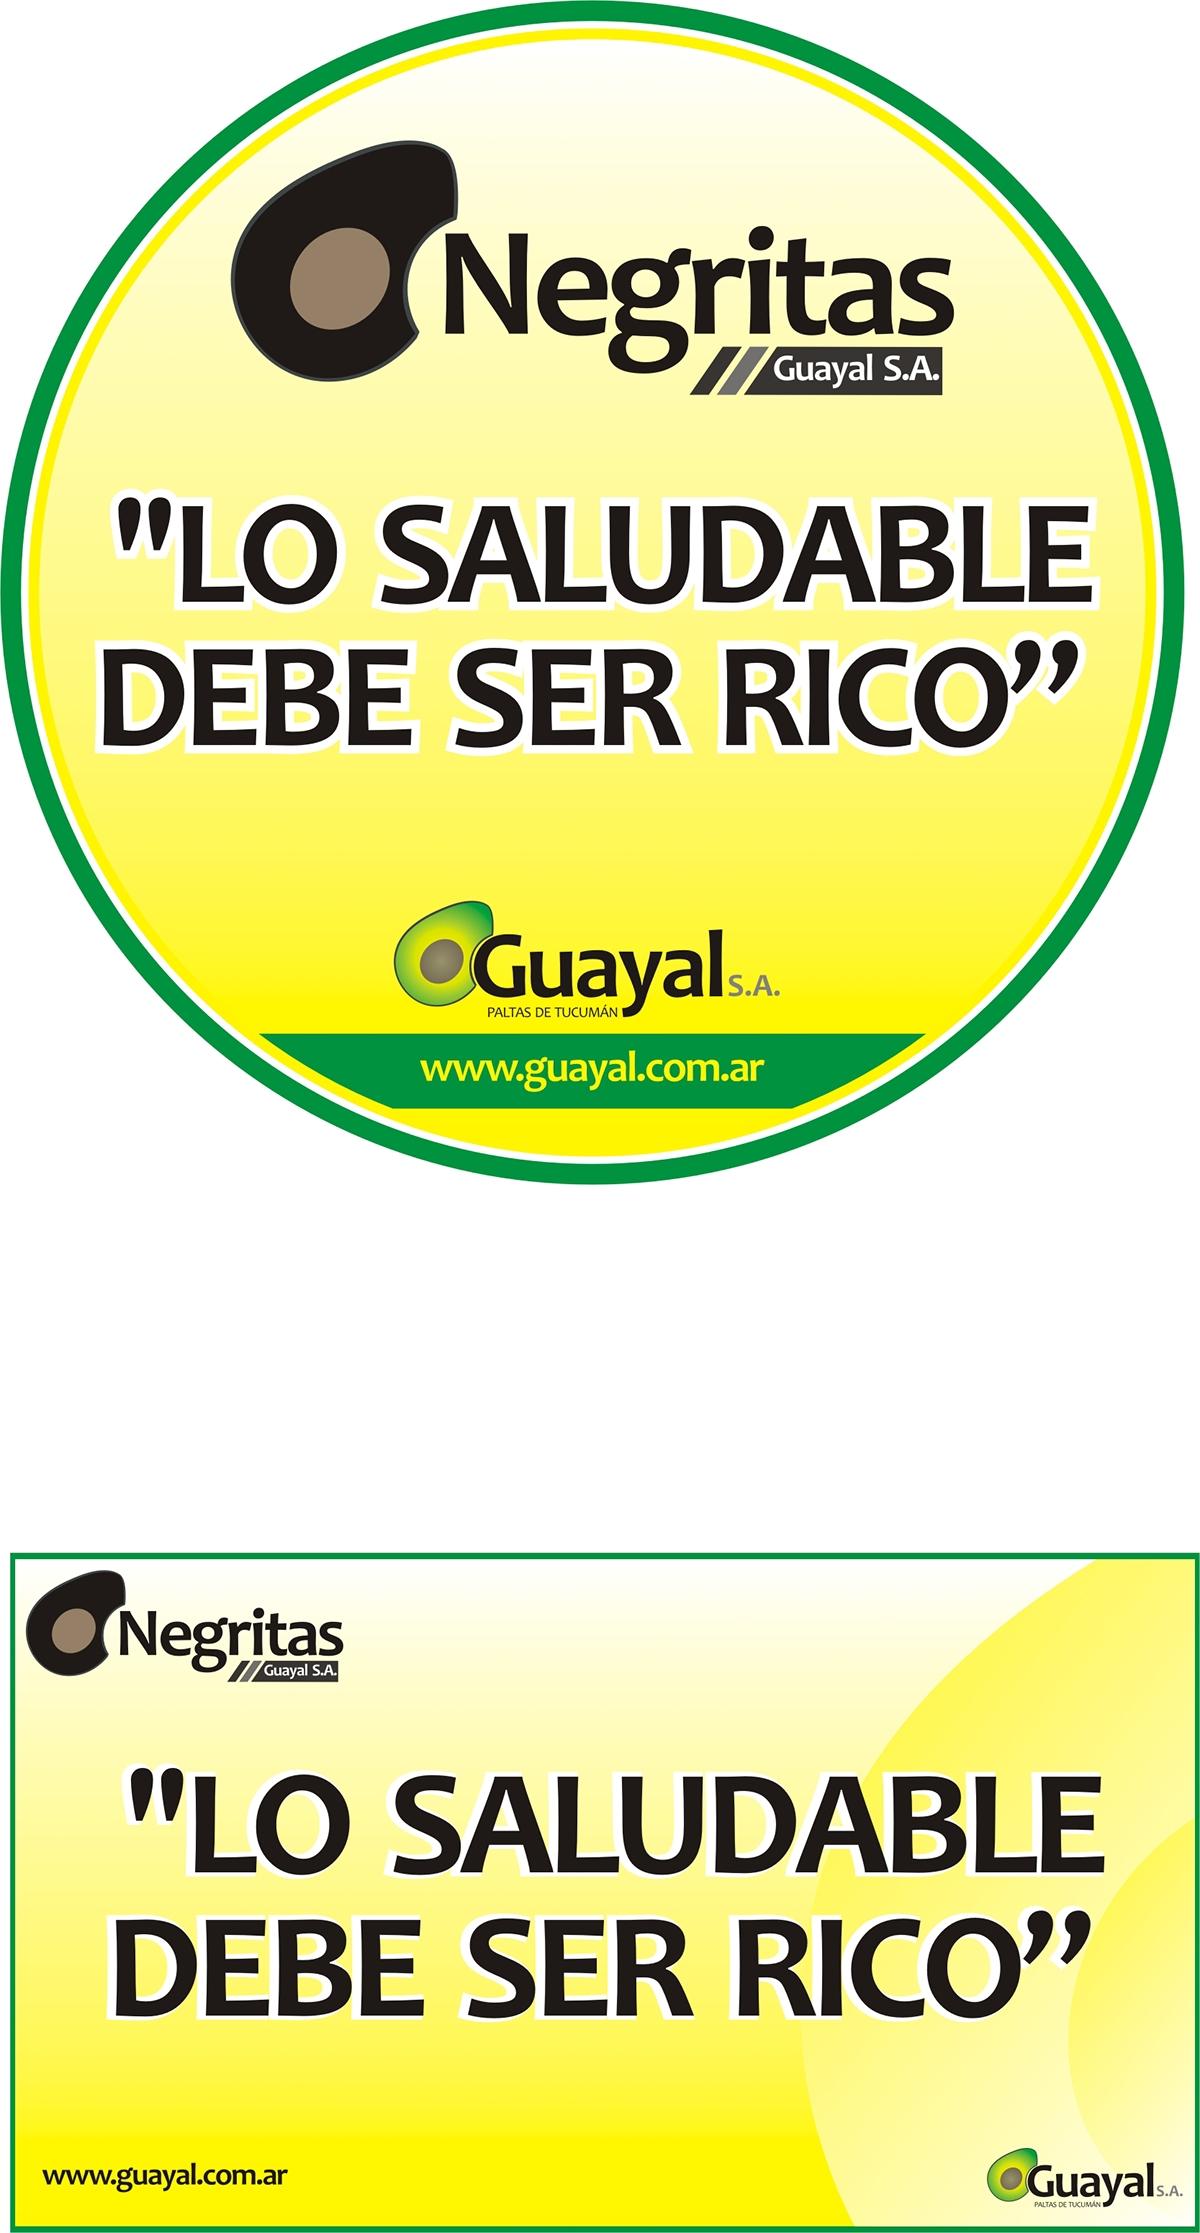 guayal palta avocado tucuman argentina